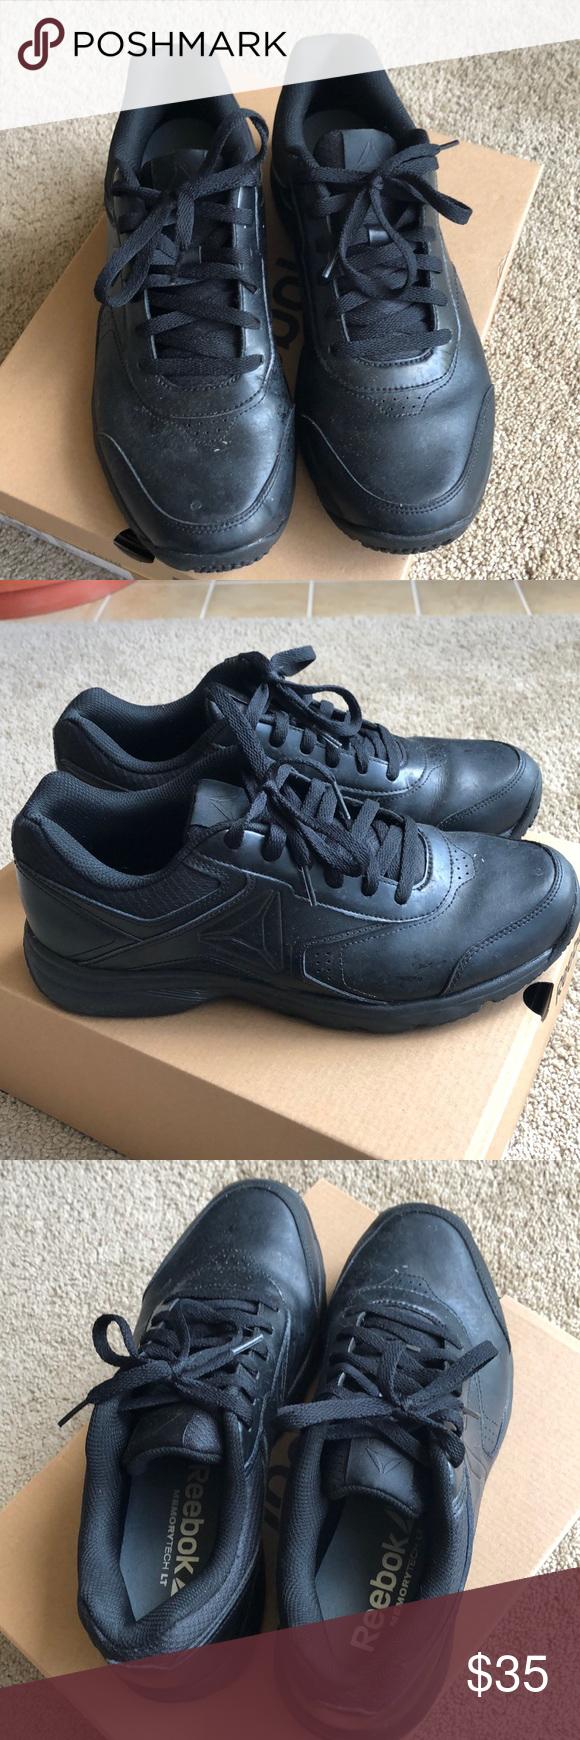 perspectiva Cada semana persona que practica jogging  Reebok slip resistant work shoes Oil resistant Slip resistant Reebok Shoes  Sneakers | Work shoes, Shoes, Reebok shoes